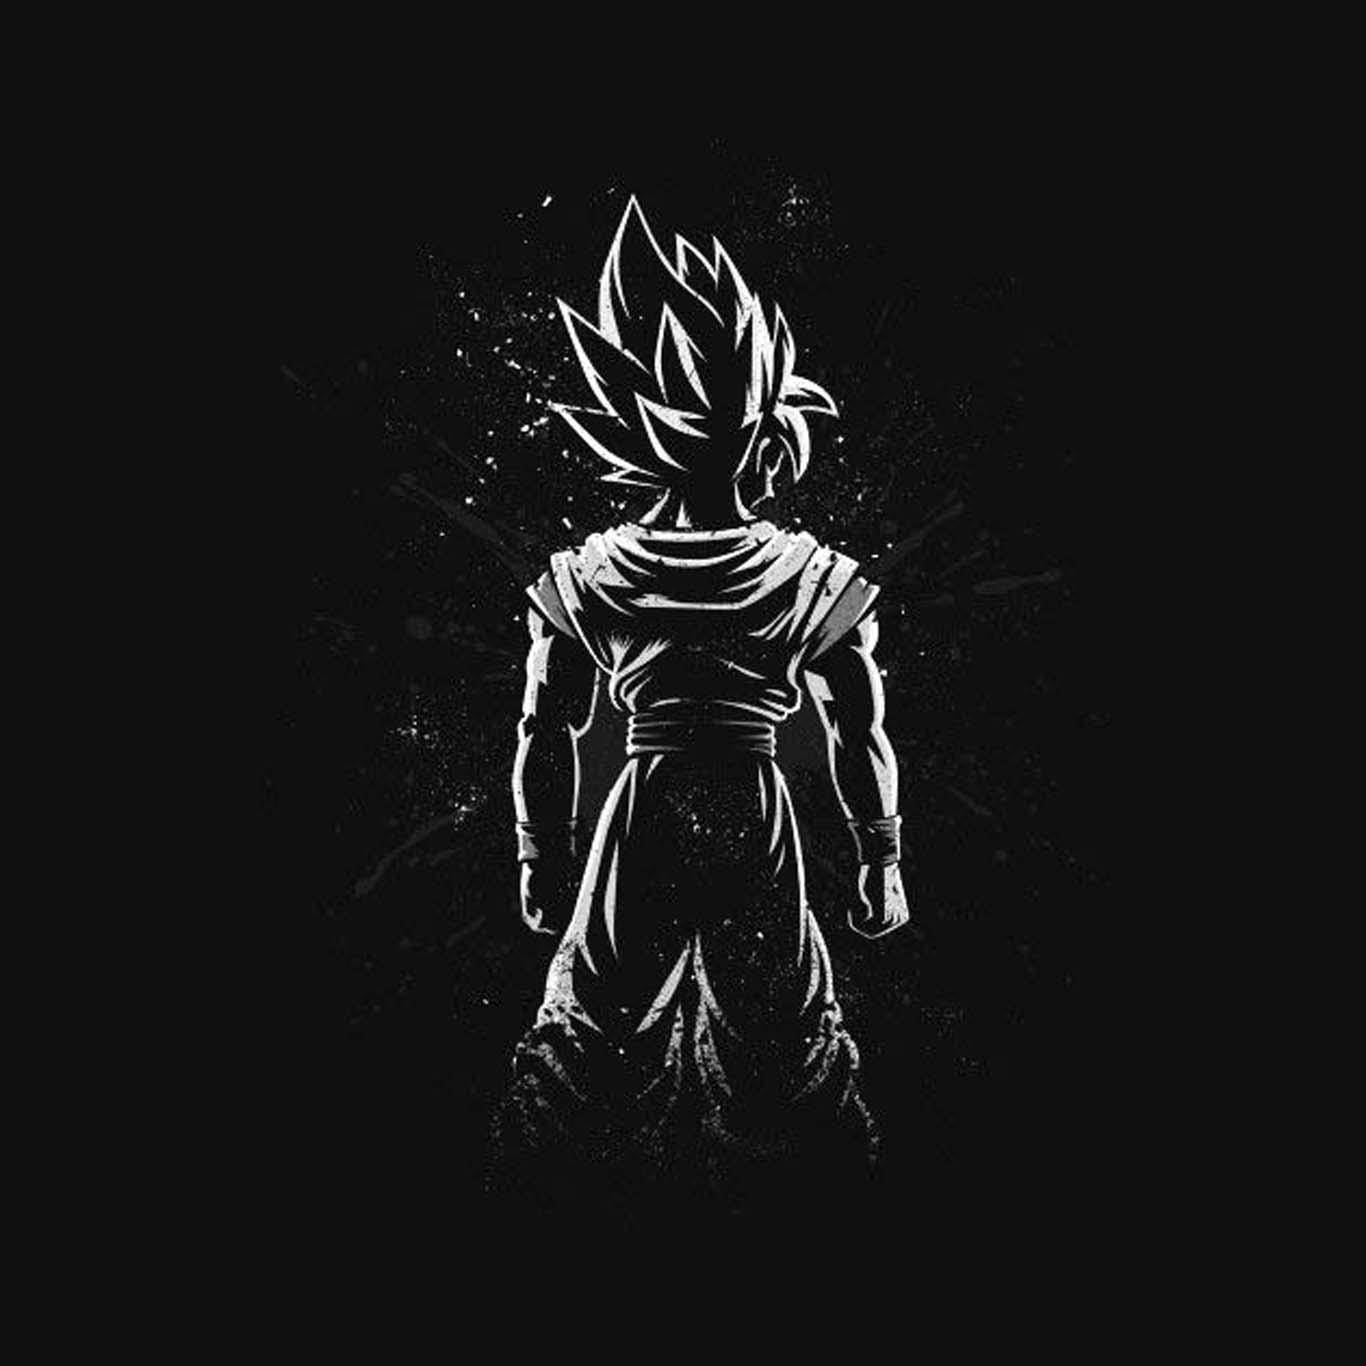 Wallpaper Son Goku Dragon Ball 1366x1366 Blackstaruk 1341517 Hd Wallpapers Wallhere